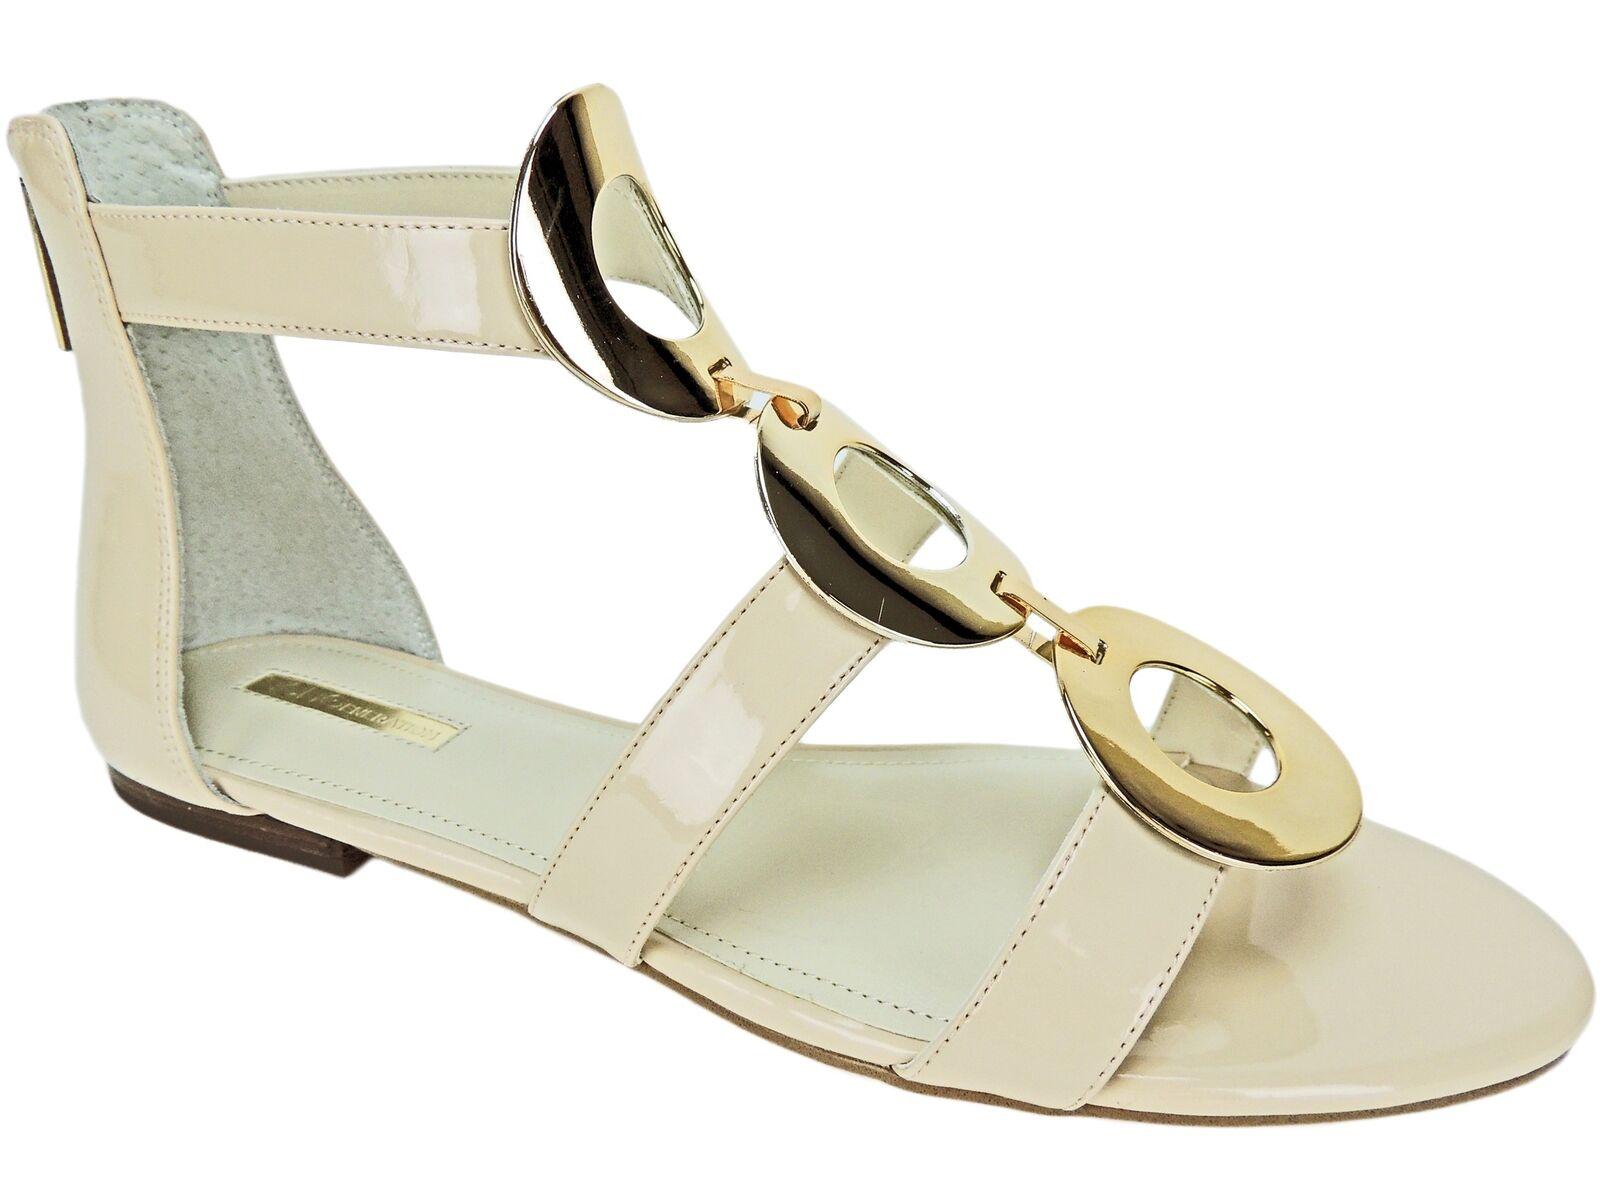 BCBGeneration Donna    Faroh Embellished Flat Sandals Nude Blush Dimensione 9 M 834a08